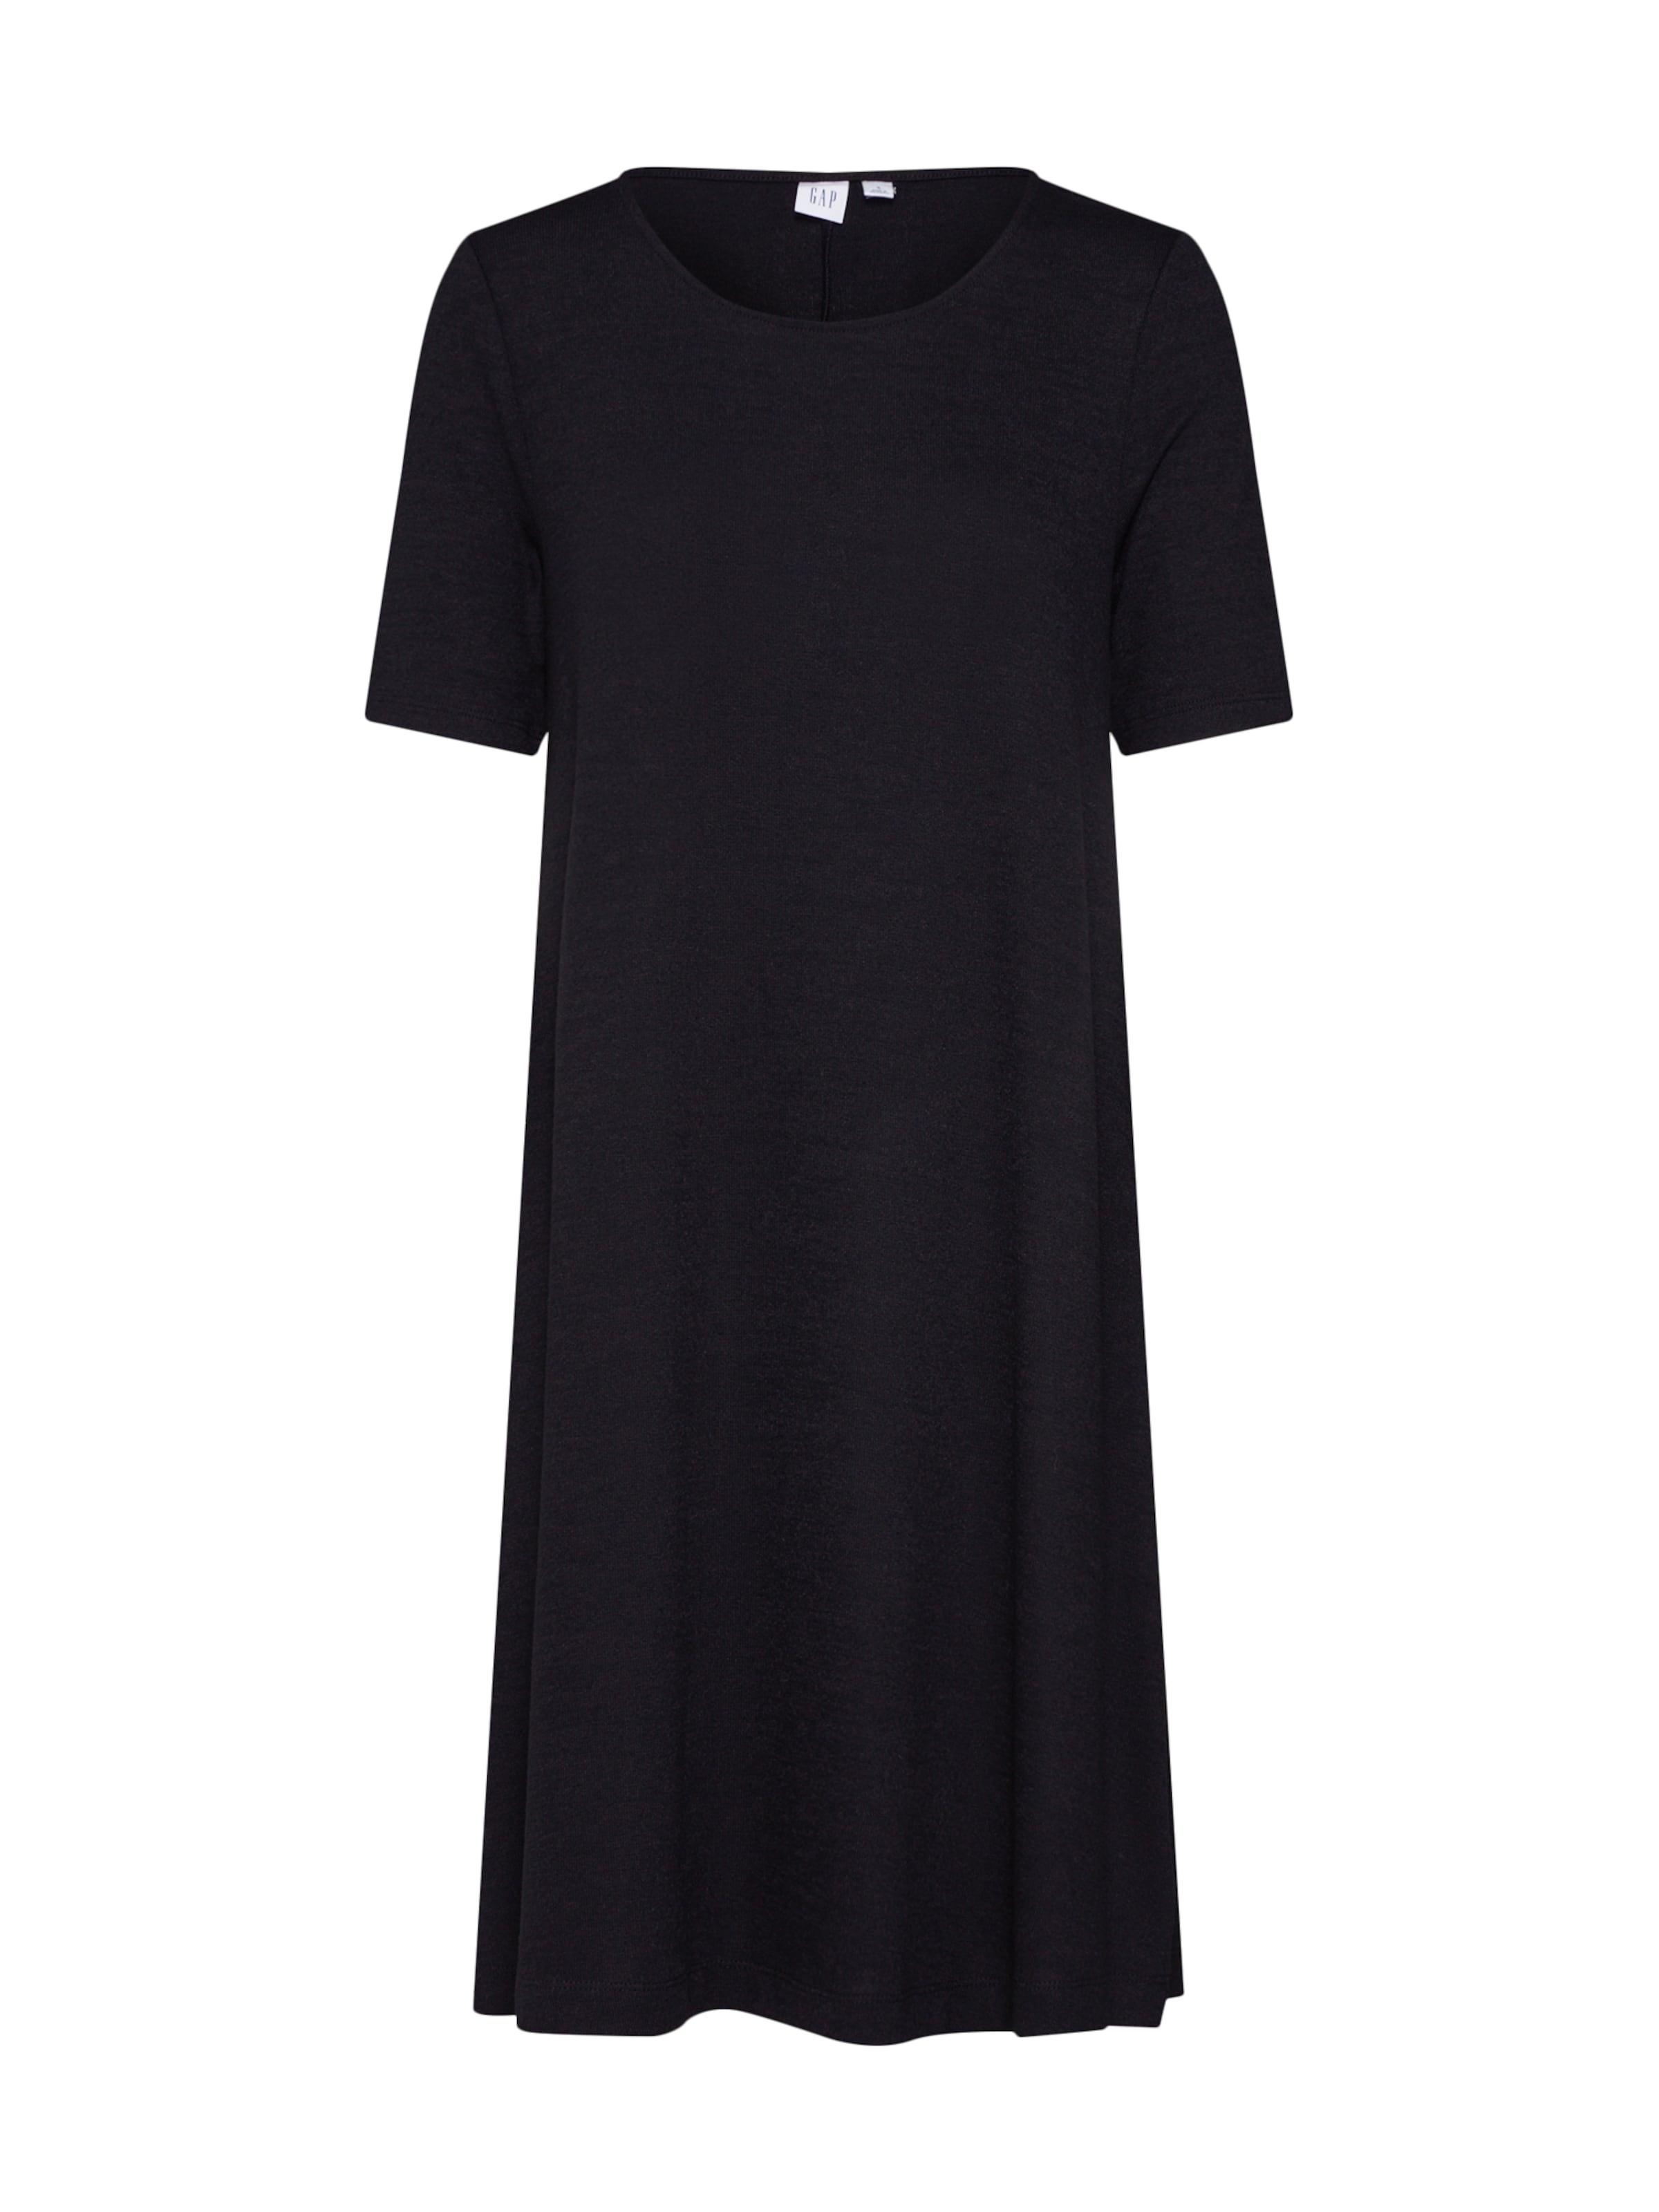 marl' Noir En Robe D'été 'sssftspnswngdrs Gap UzSpqVGM